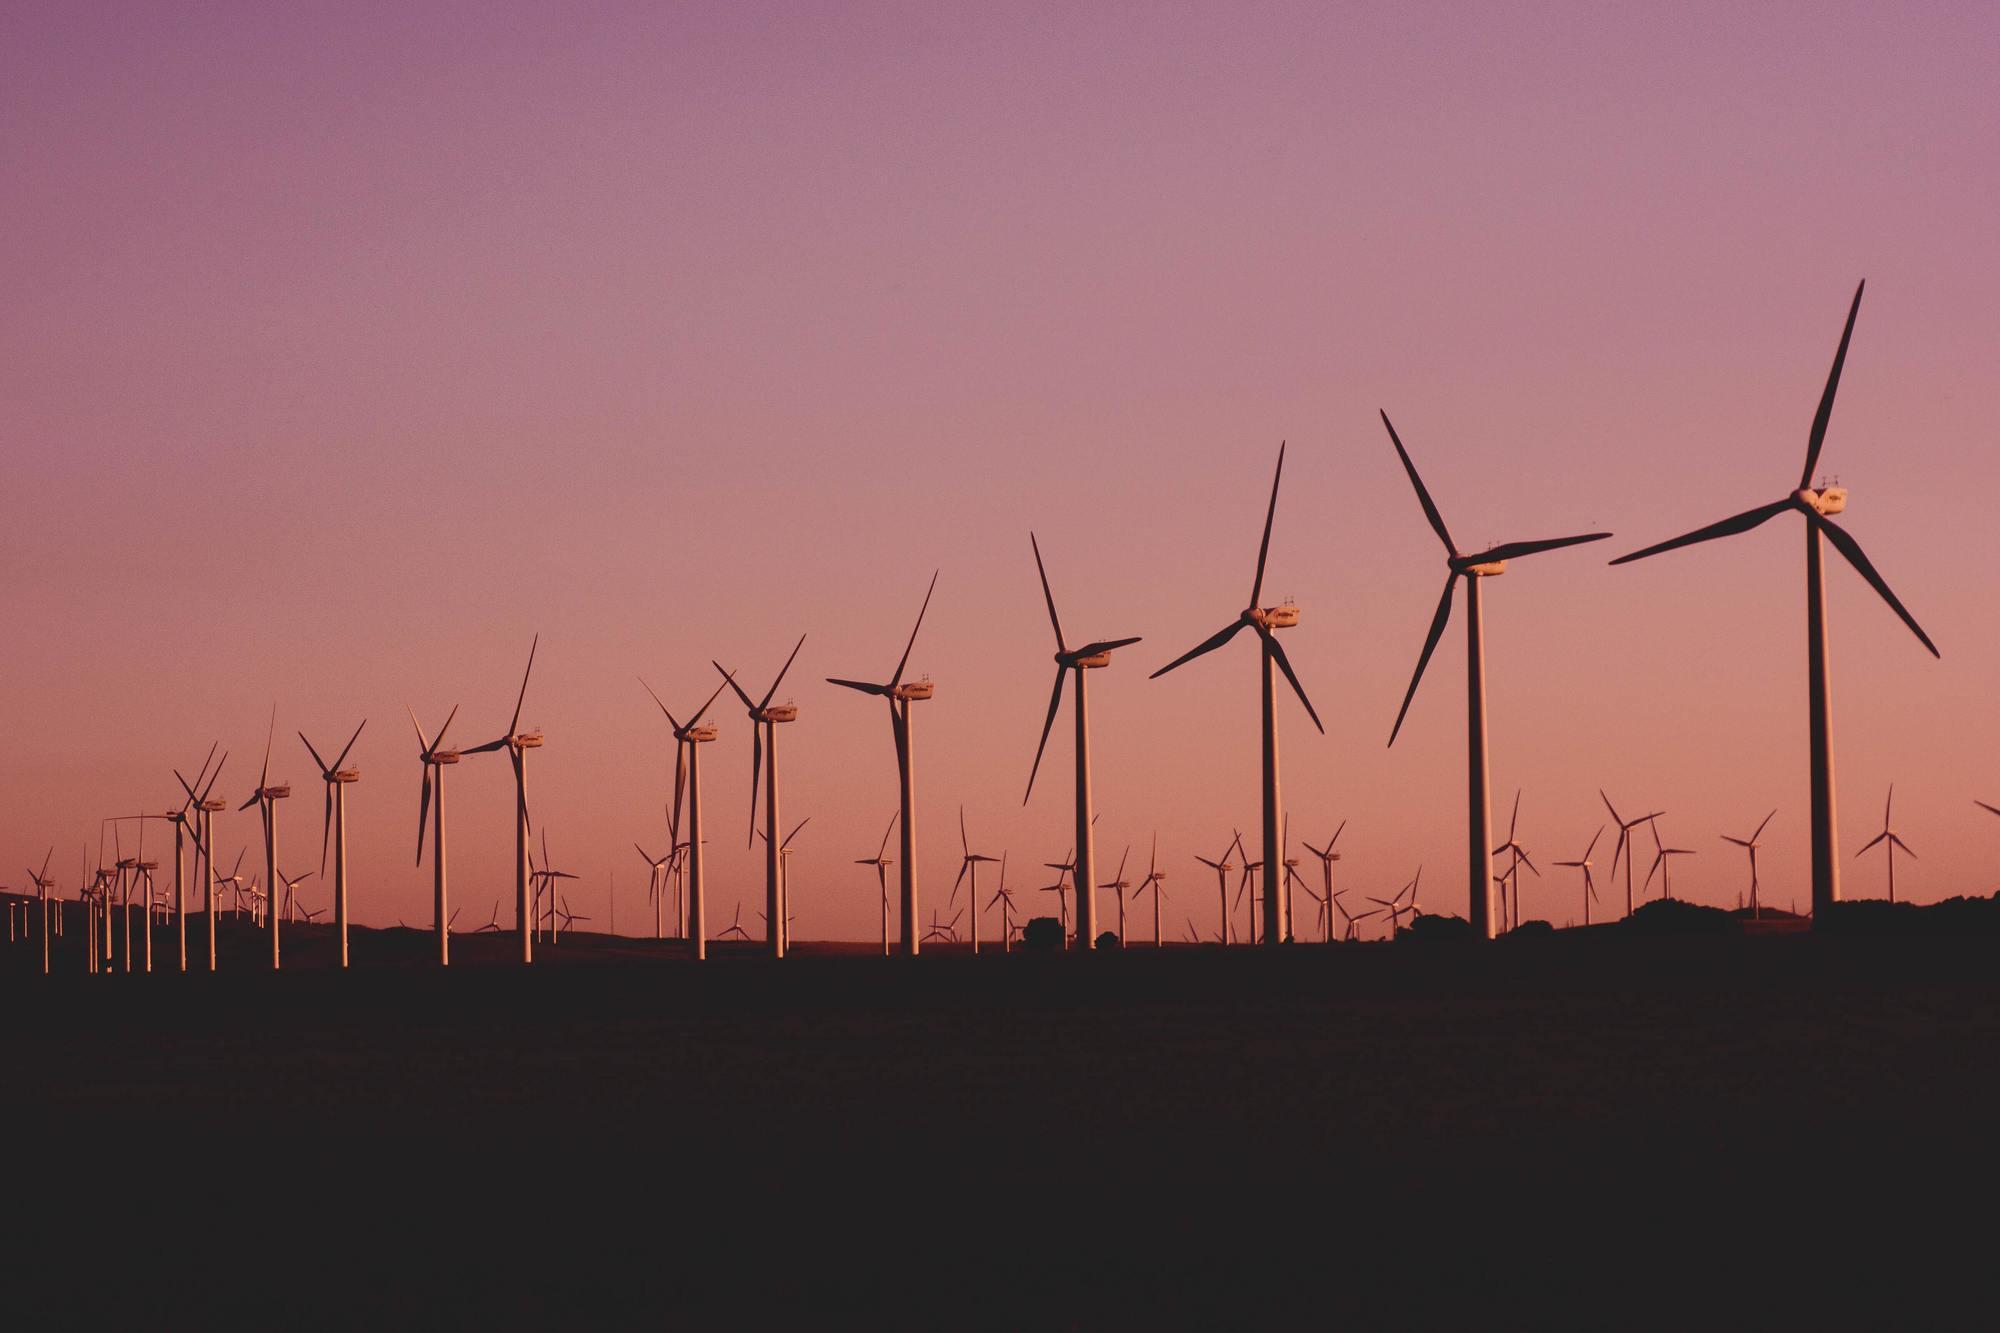 Vėjo jėgainių parkas. Foto